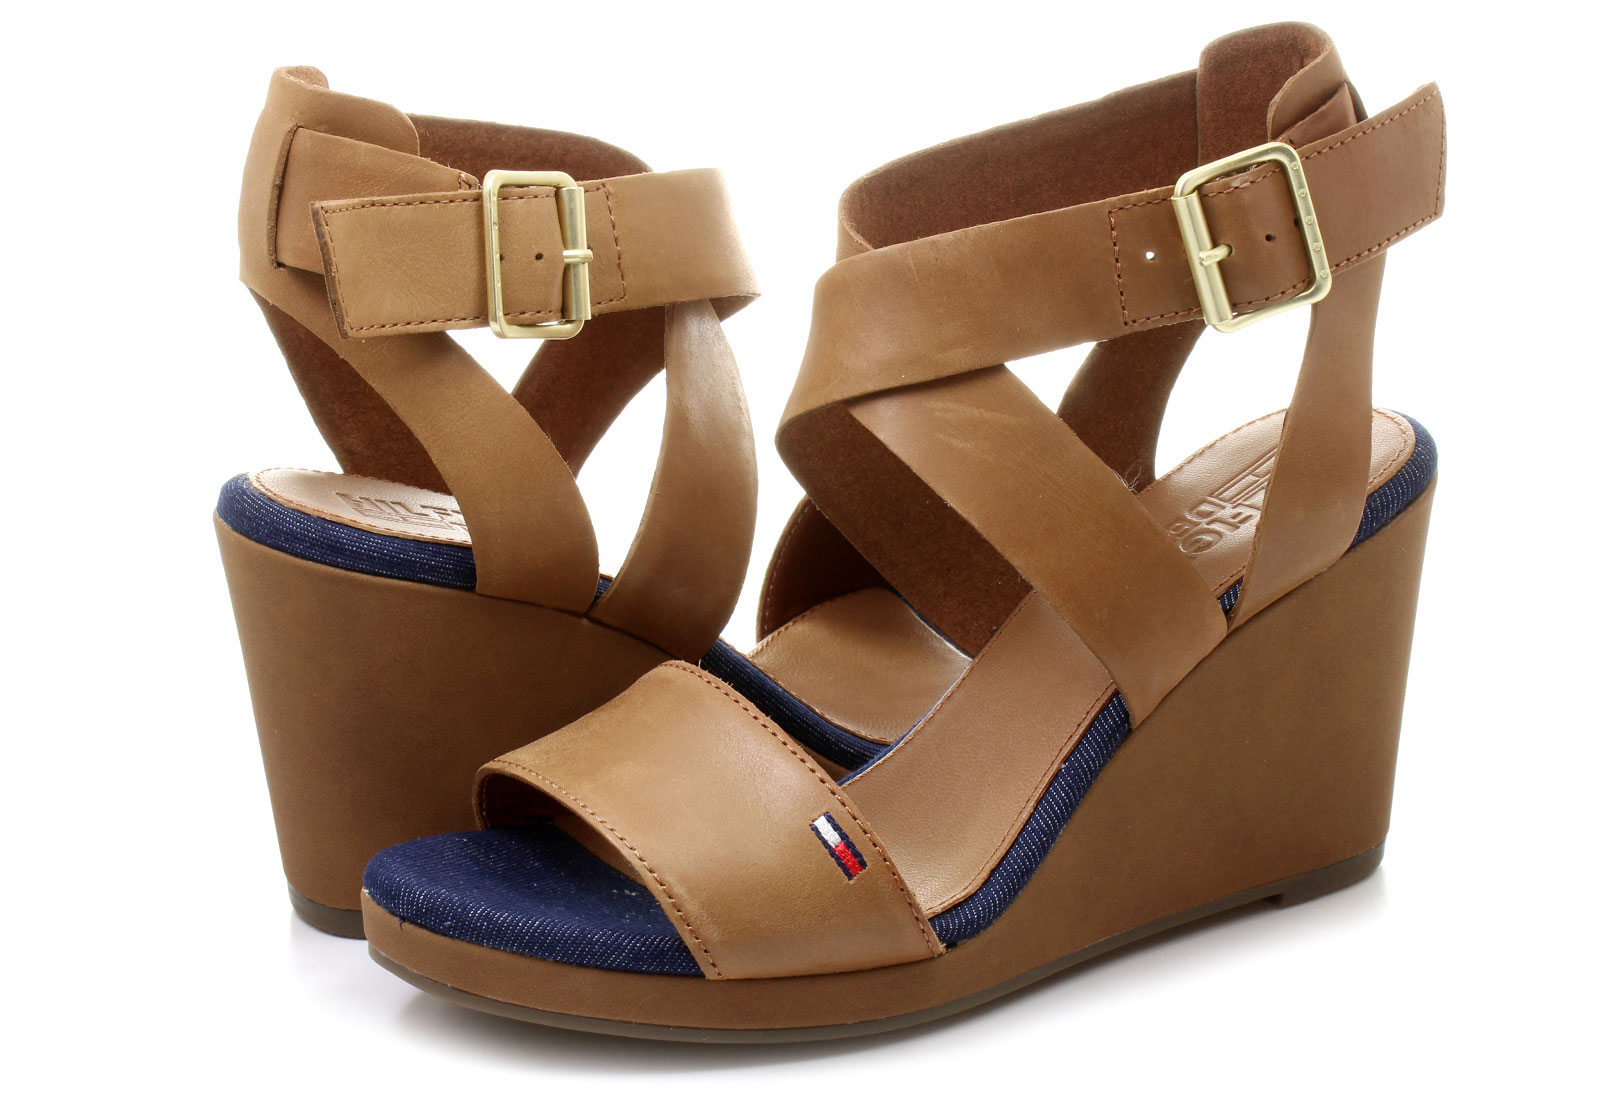 b37e025520be3 Tommy Hilfiger Sandals - Lala 7a - 16S-0951-929 - Online shop for ...